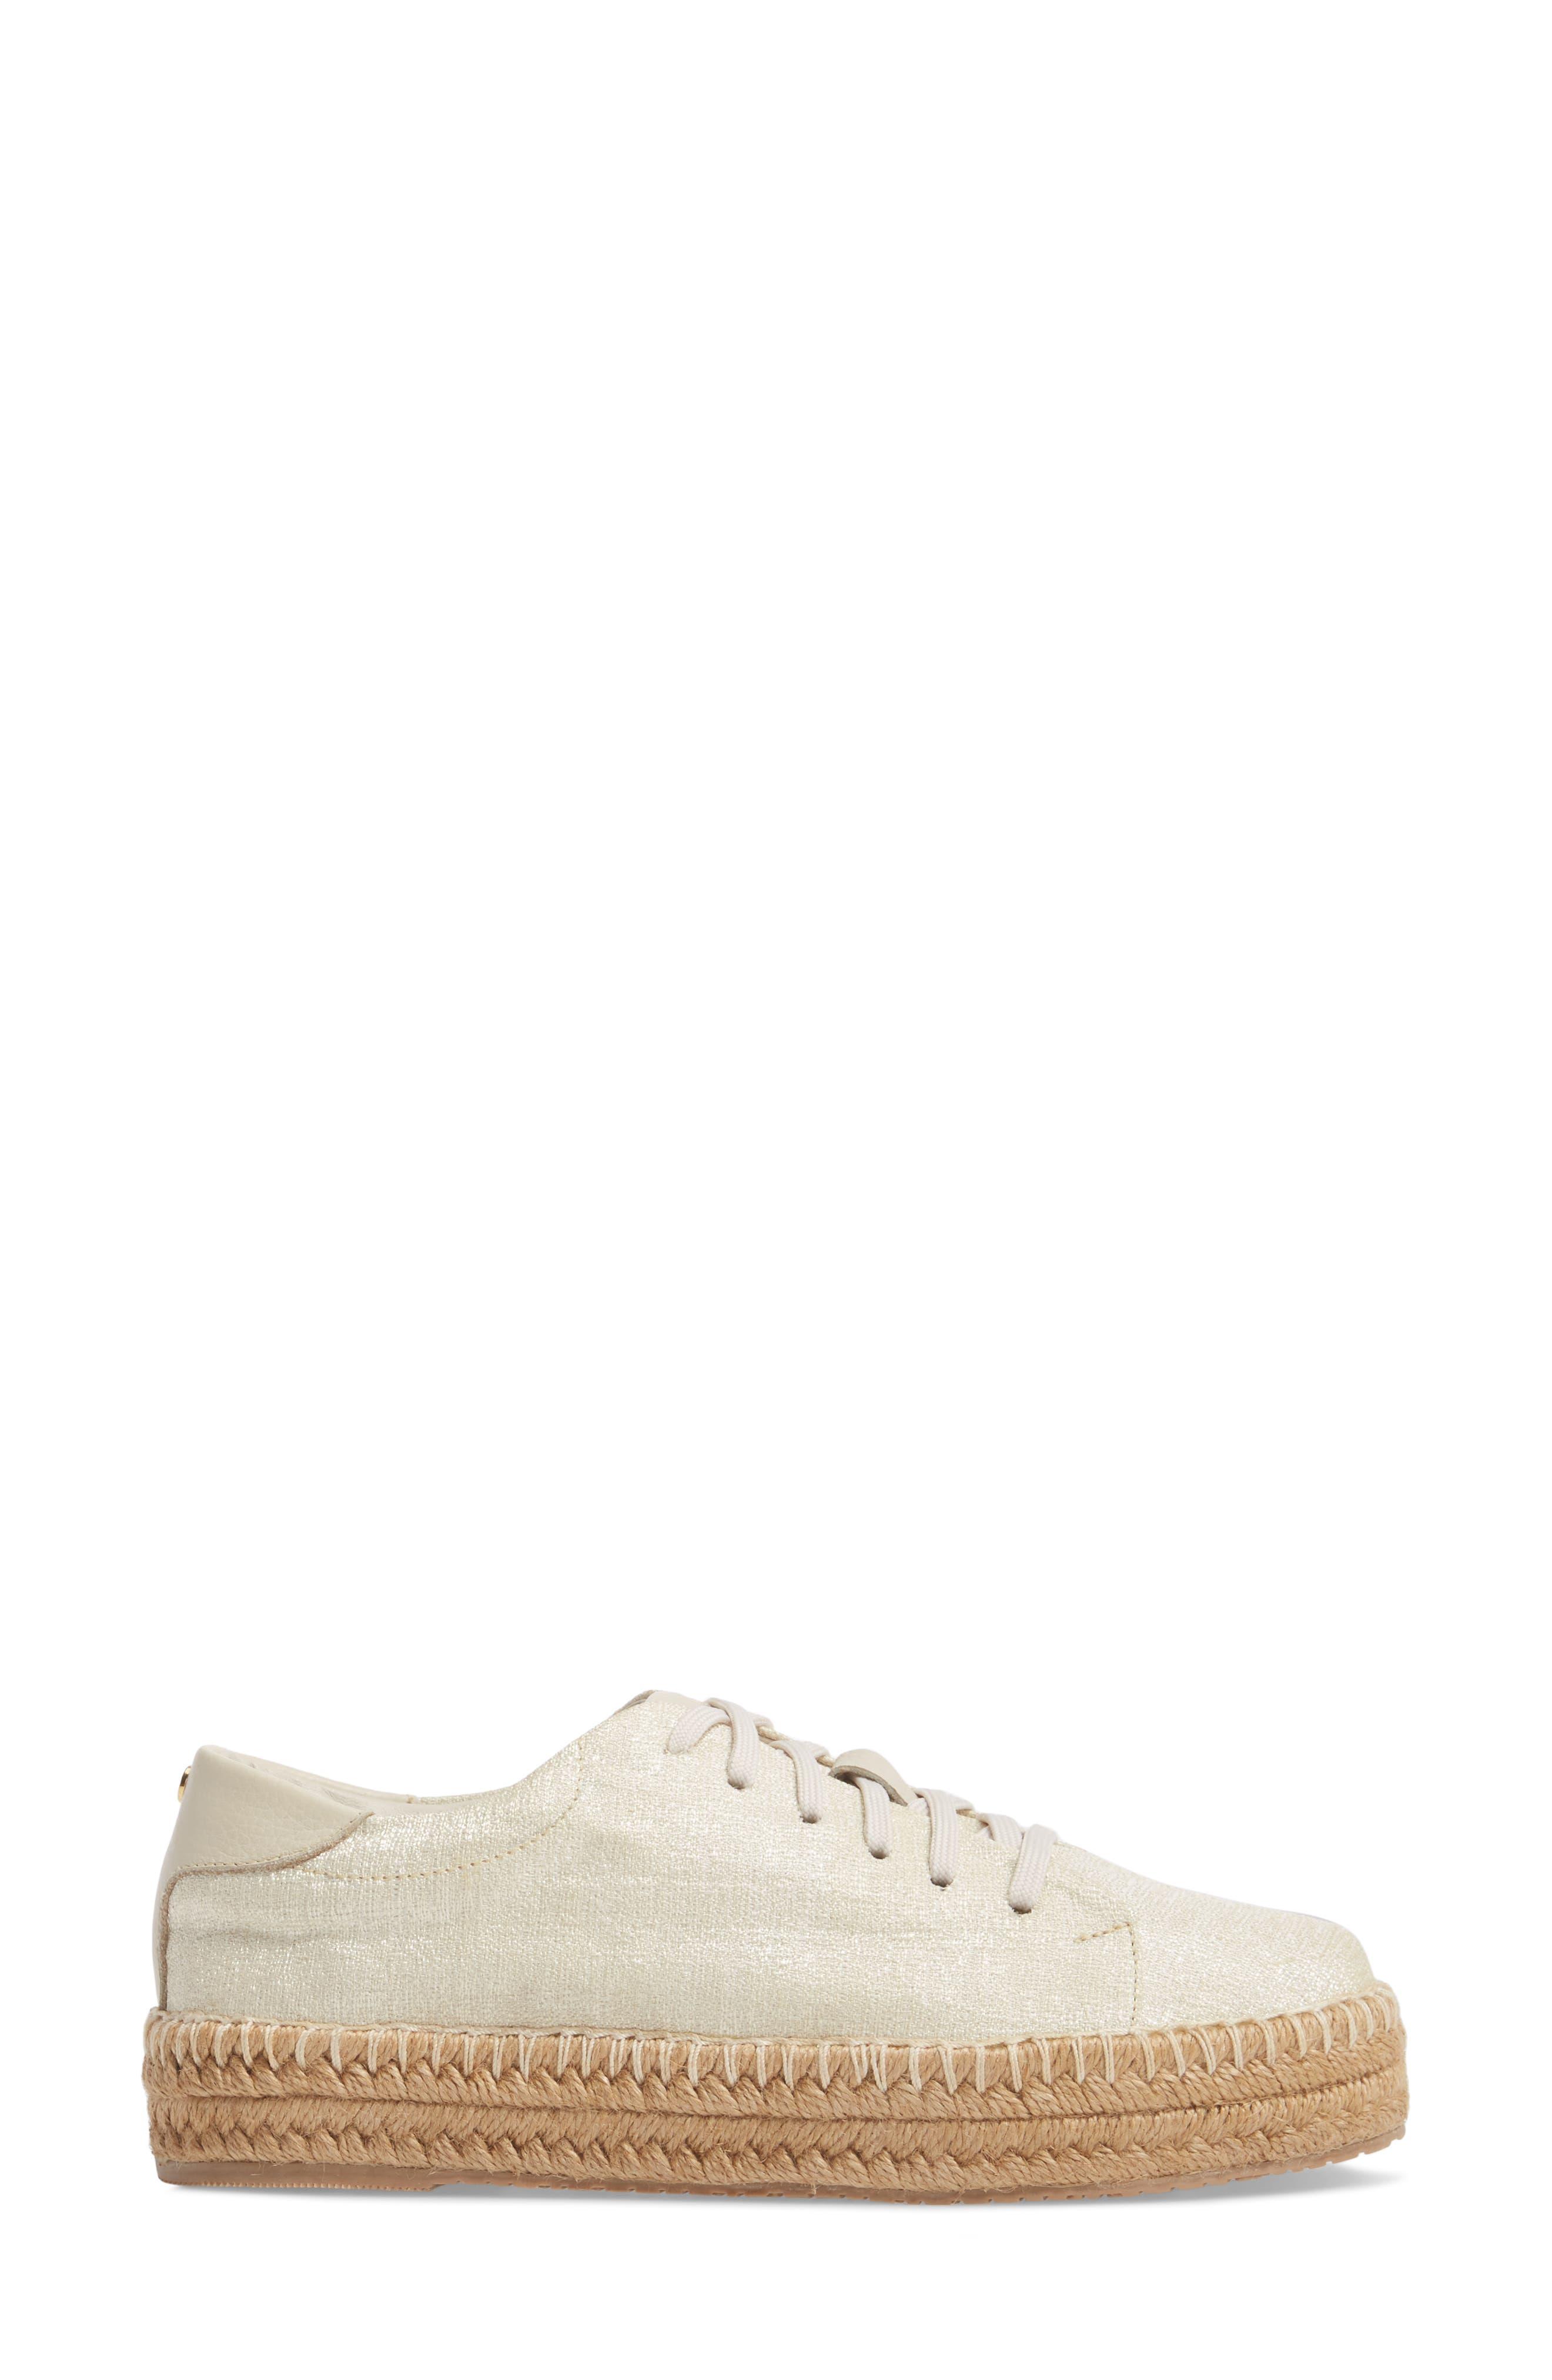 Nogales Sneaker Espadrille,                             Alternate thumbnail 3, color,                             Ivory